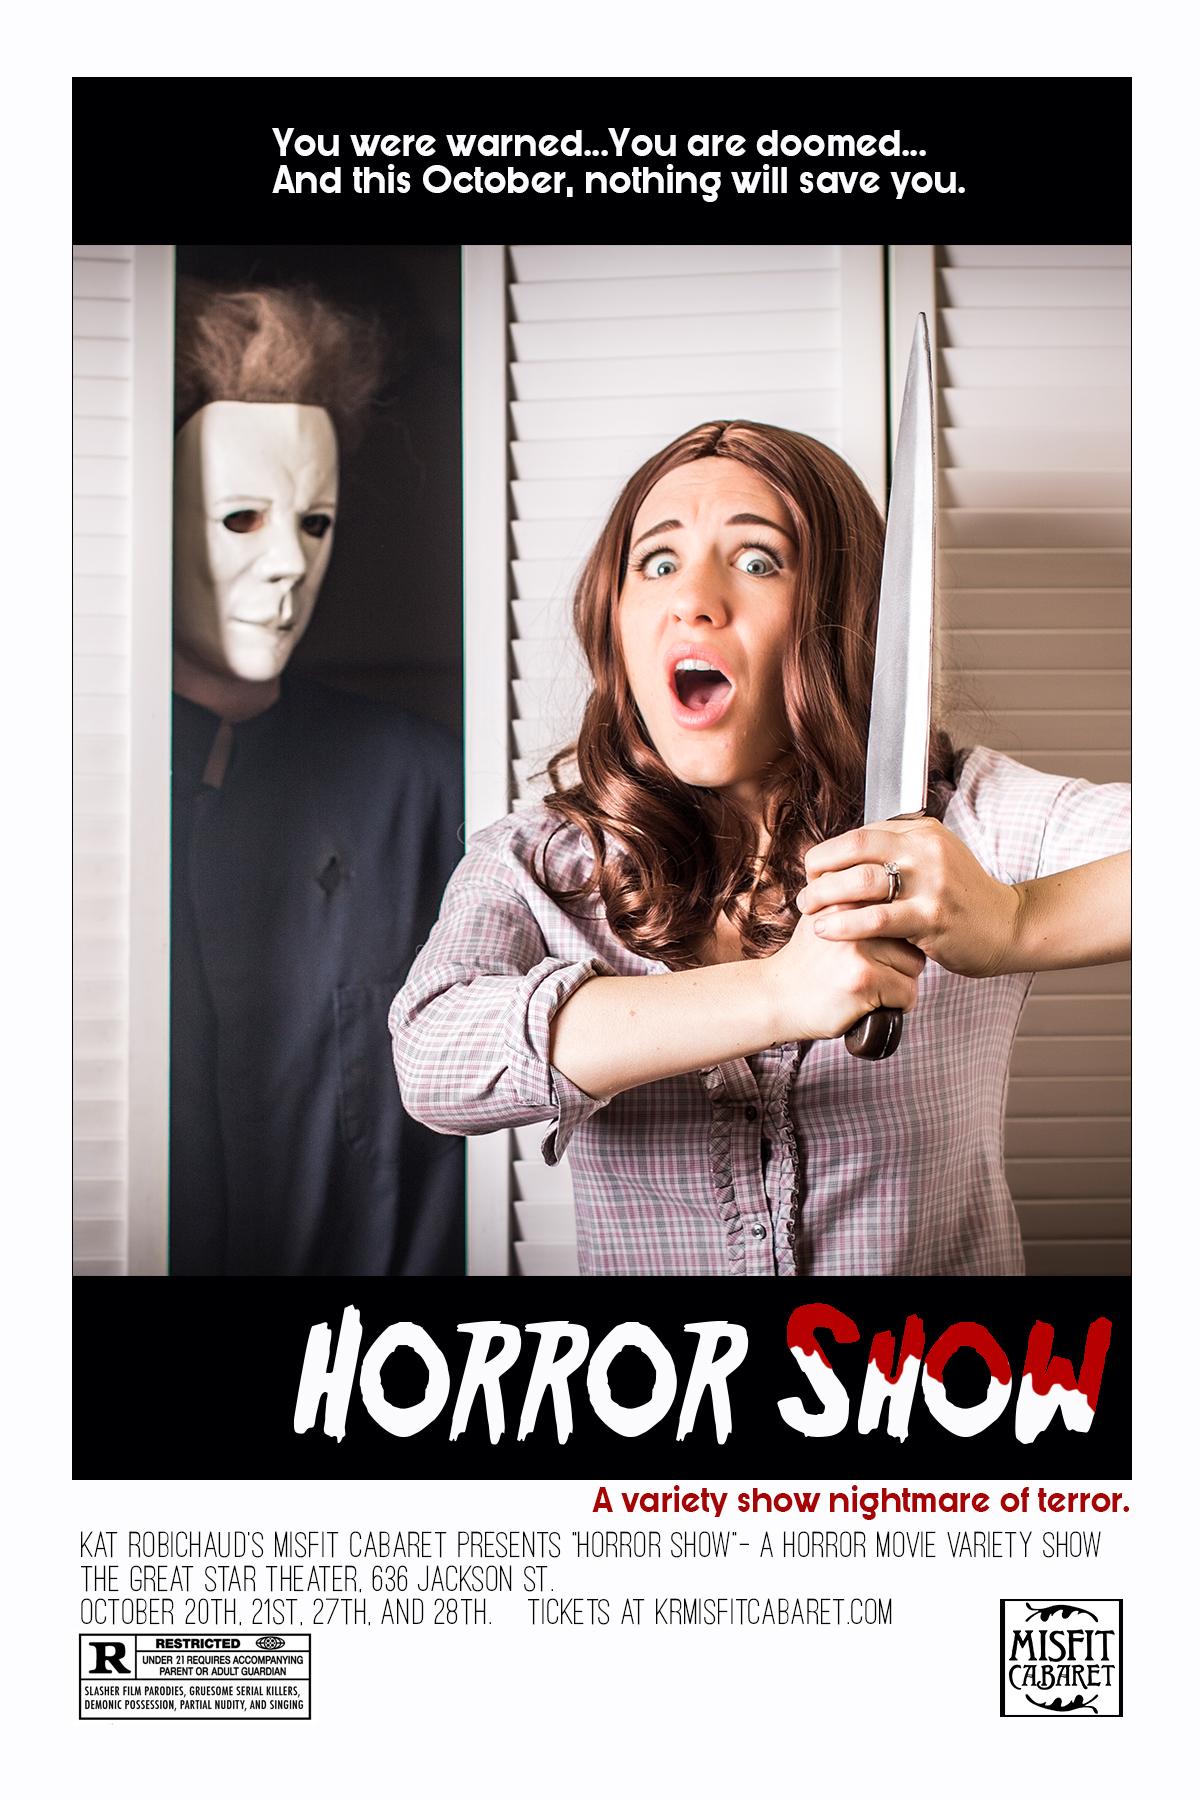 horrorshowpostcardfront.jpg